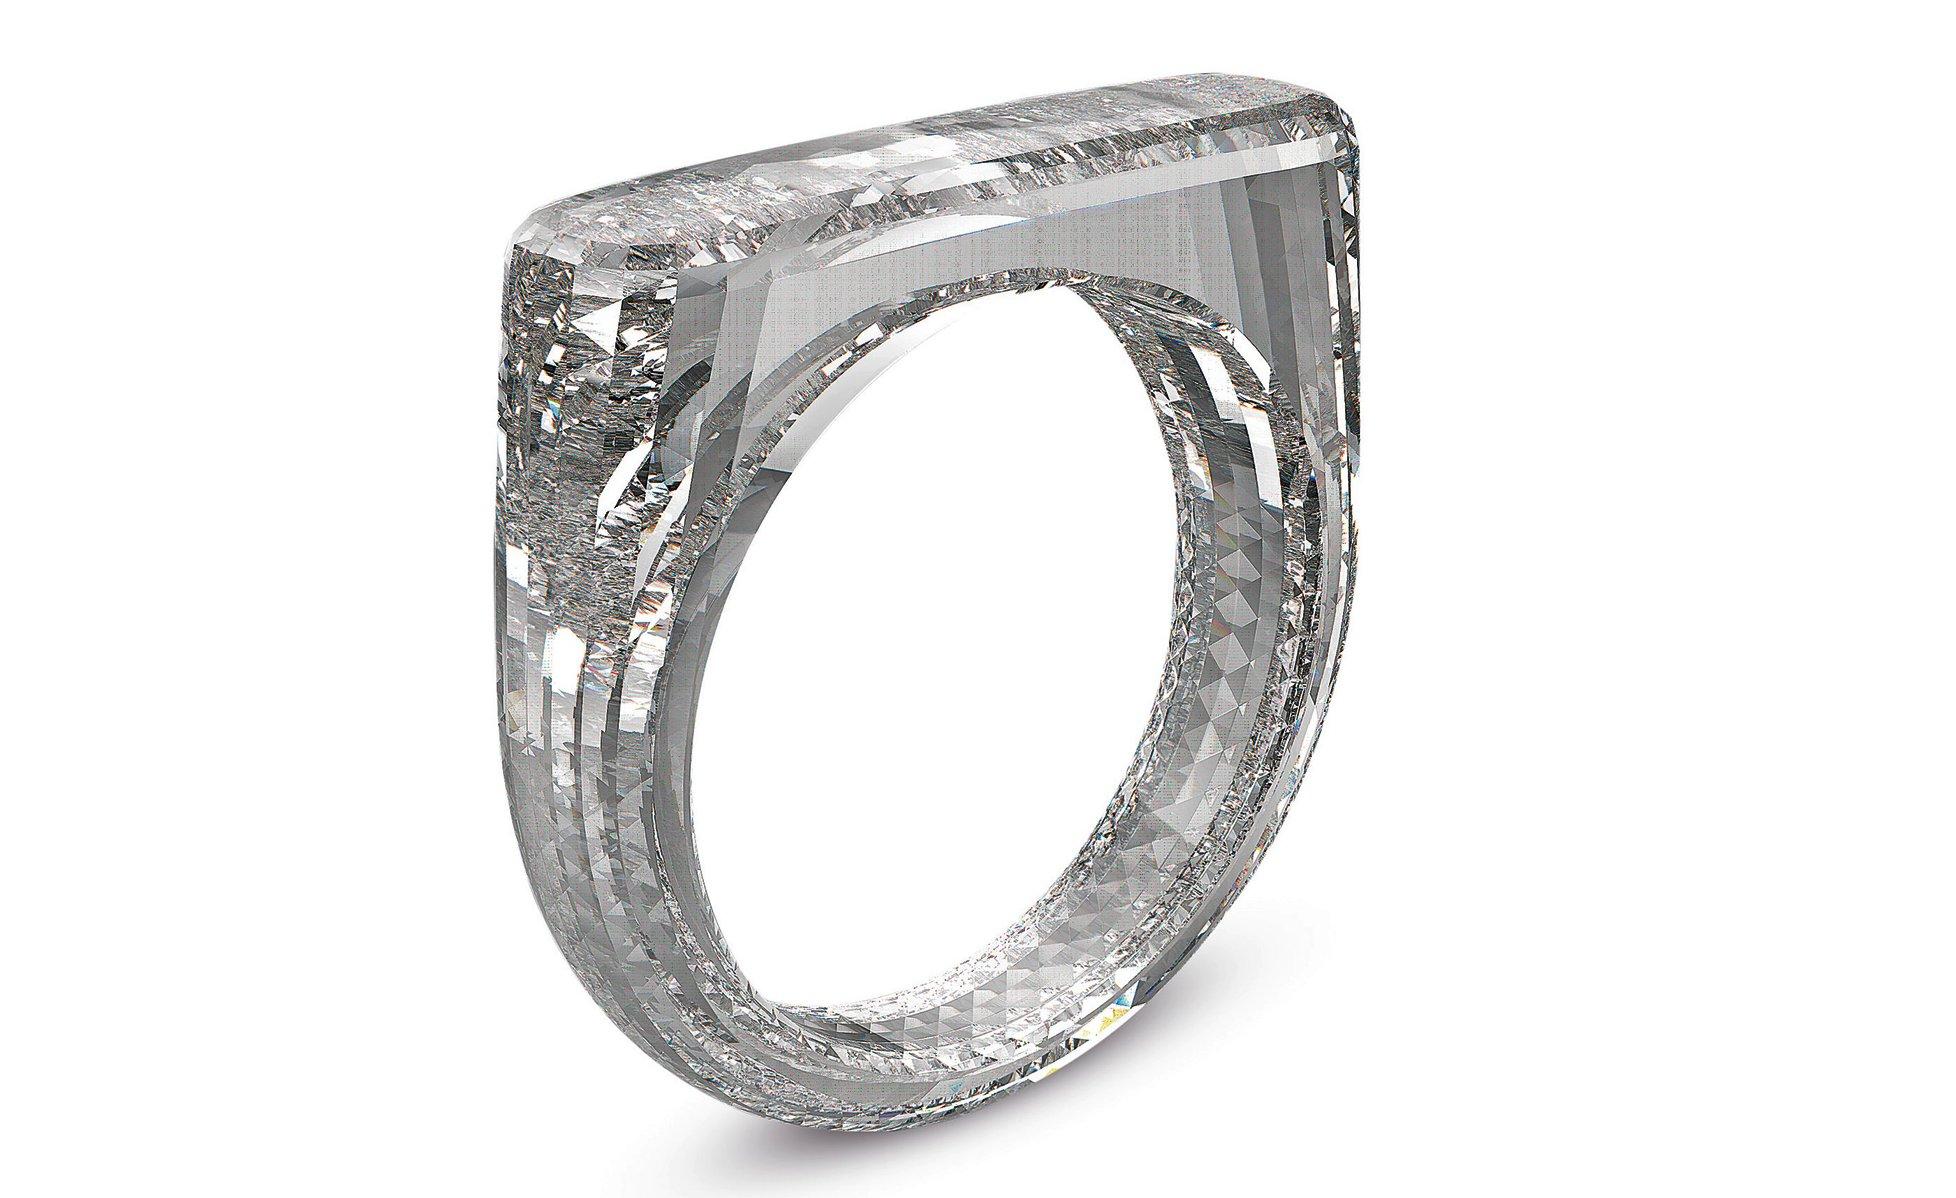 طراح ارشد اپل یک حلقه الماس 250 هزار دلاری ساخت (+عکس)